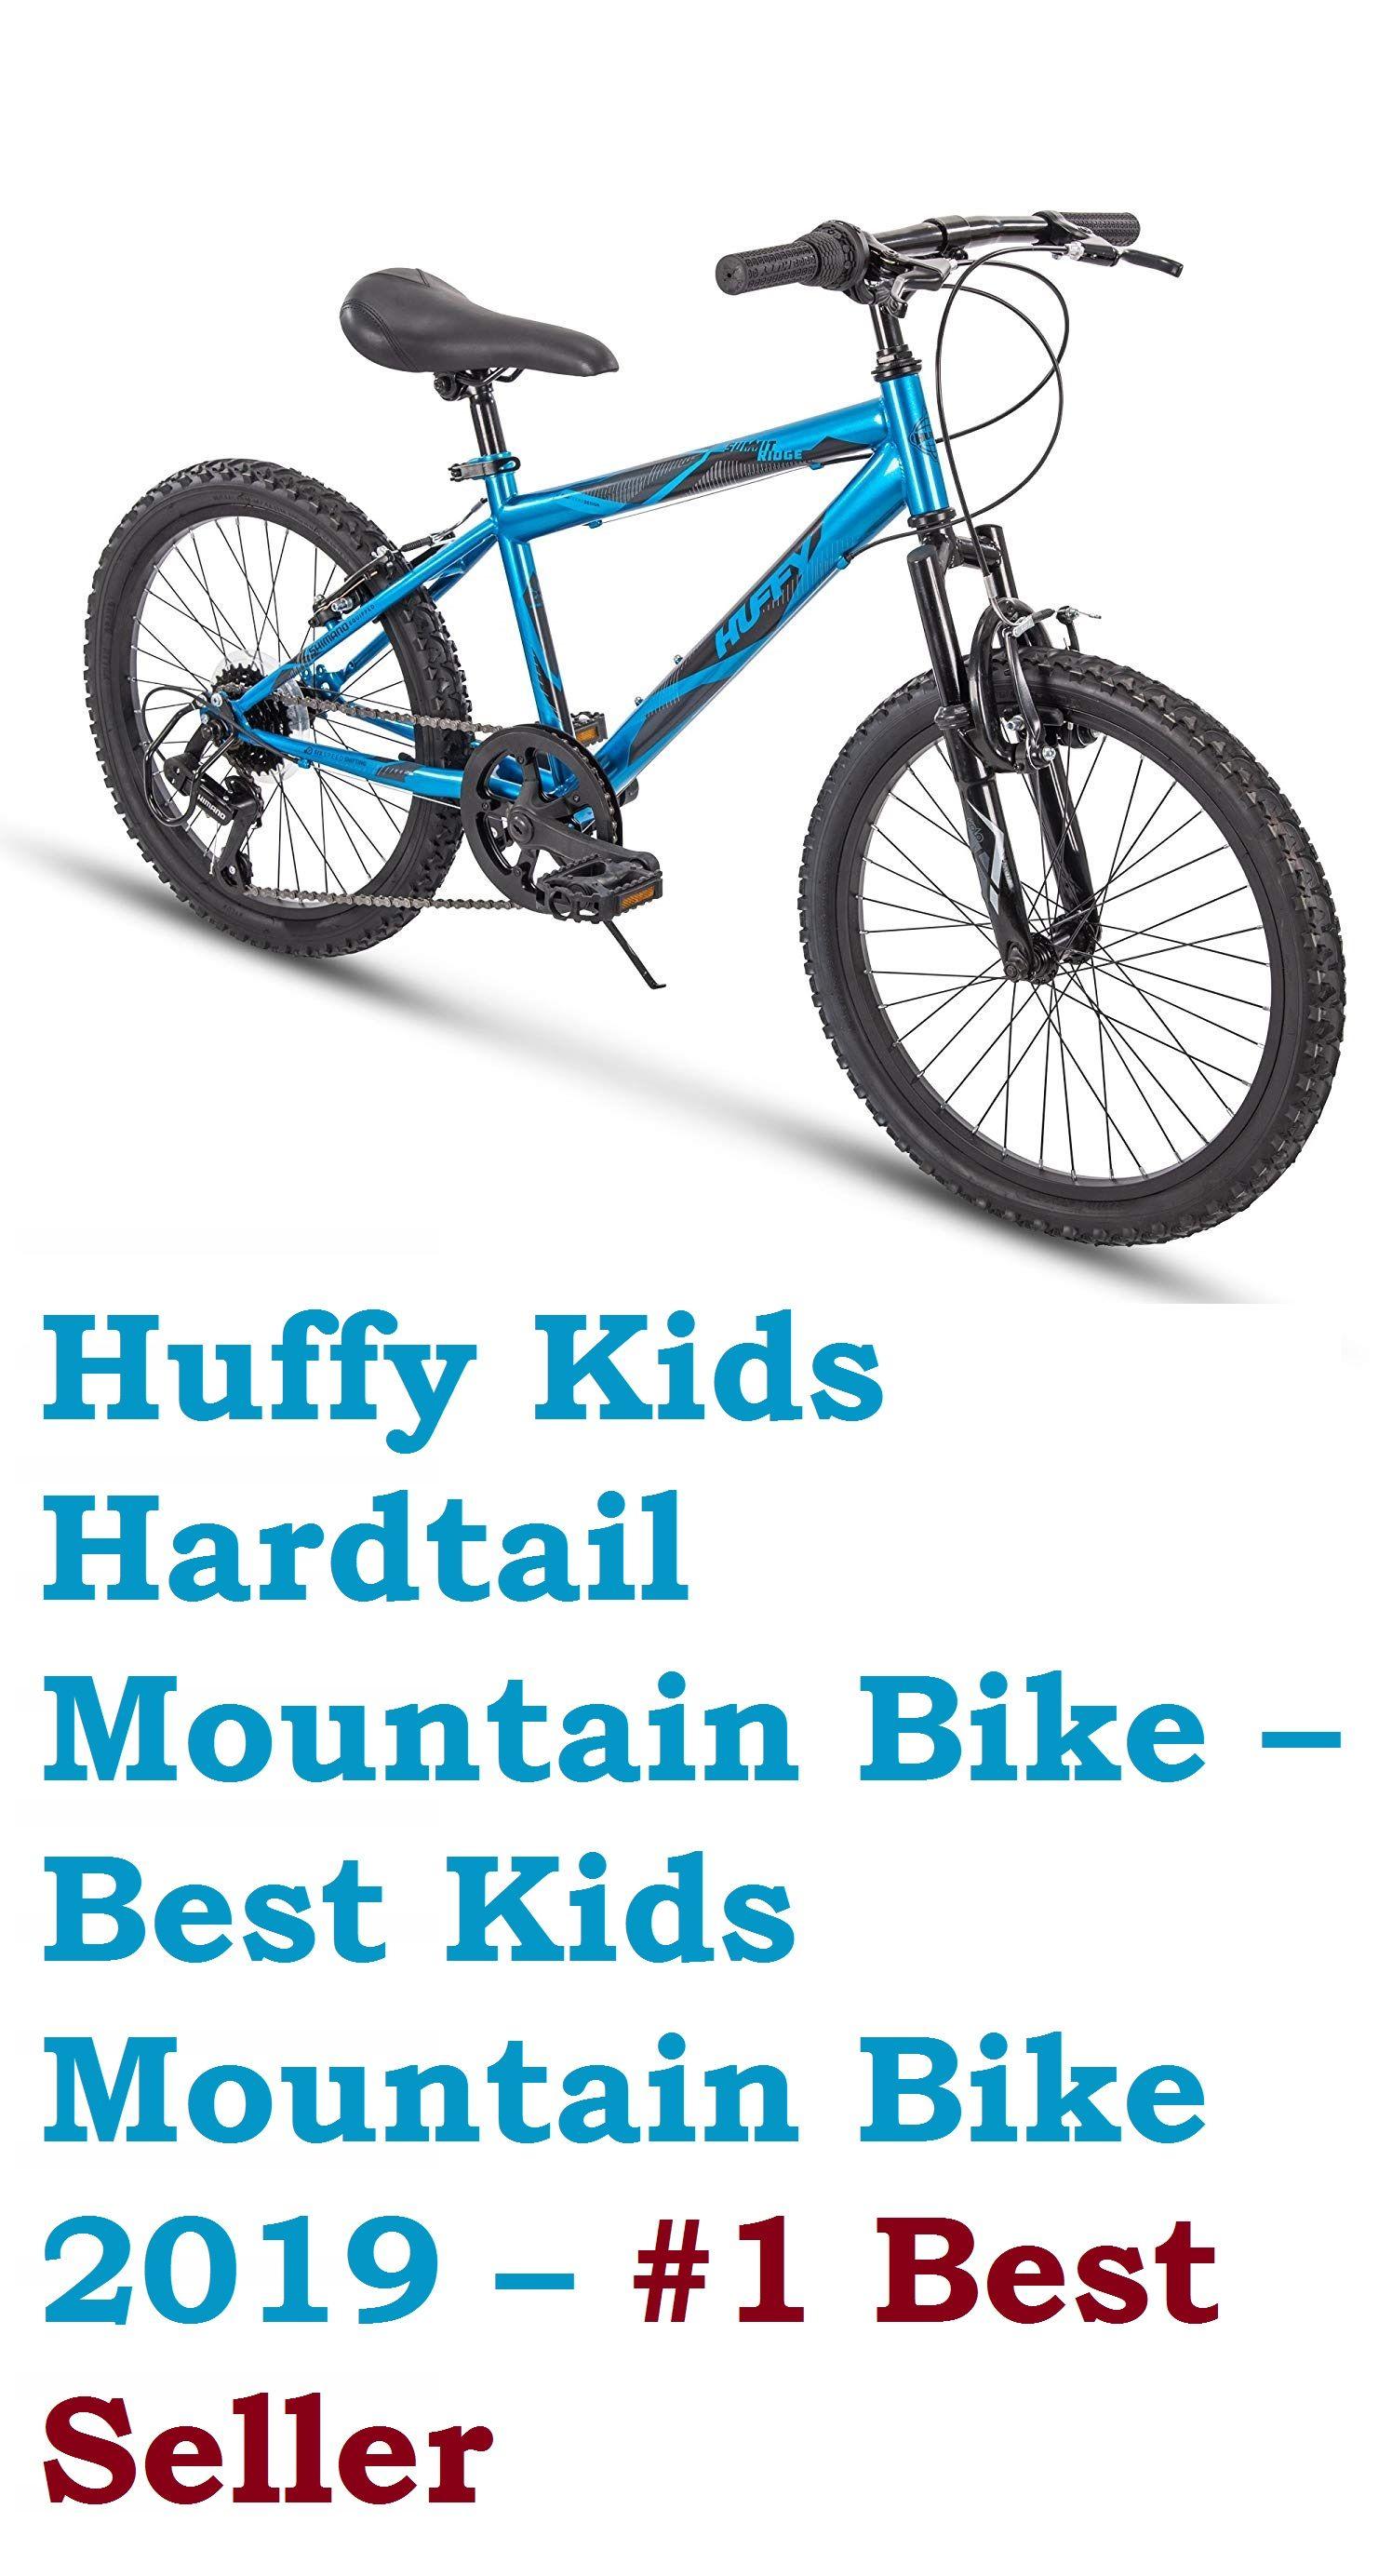 Best Mountain Bike Under 400 Best Mountain Bike Under 400 In